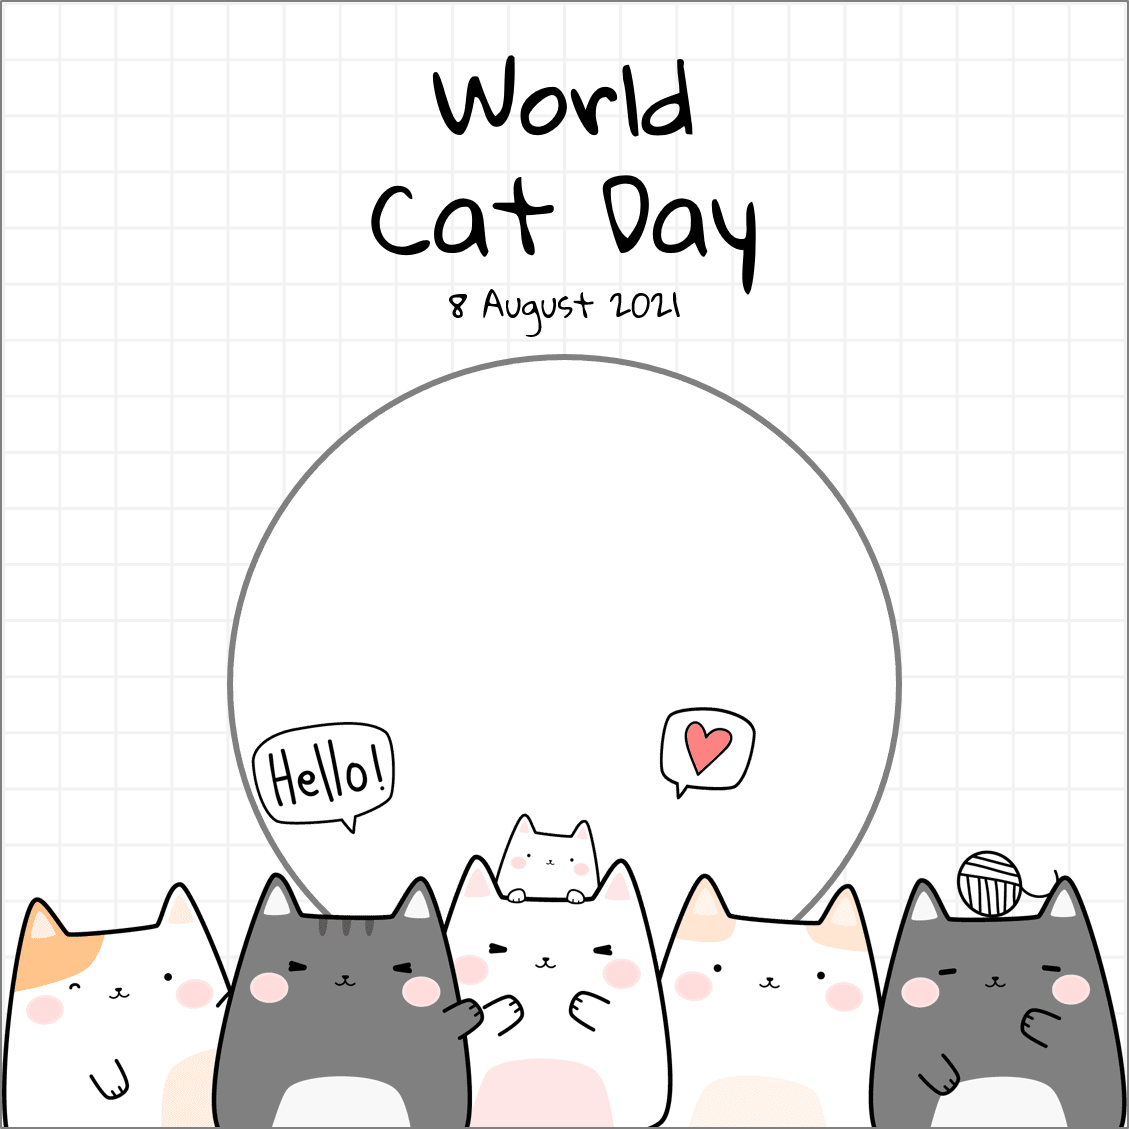 Link Download Background Frame Twibbon World Cat Day 8 August 2021 - Twibbonize